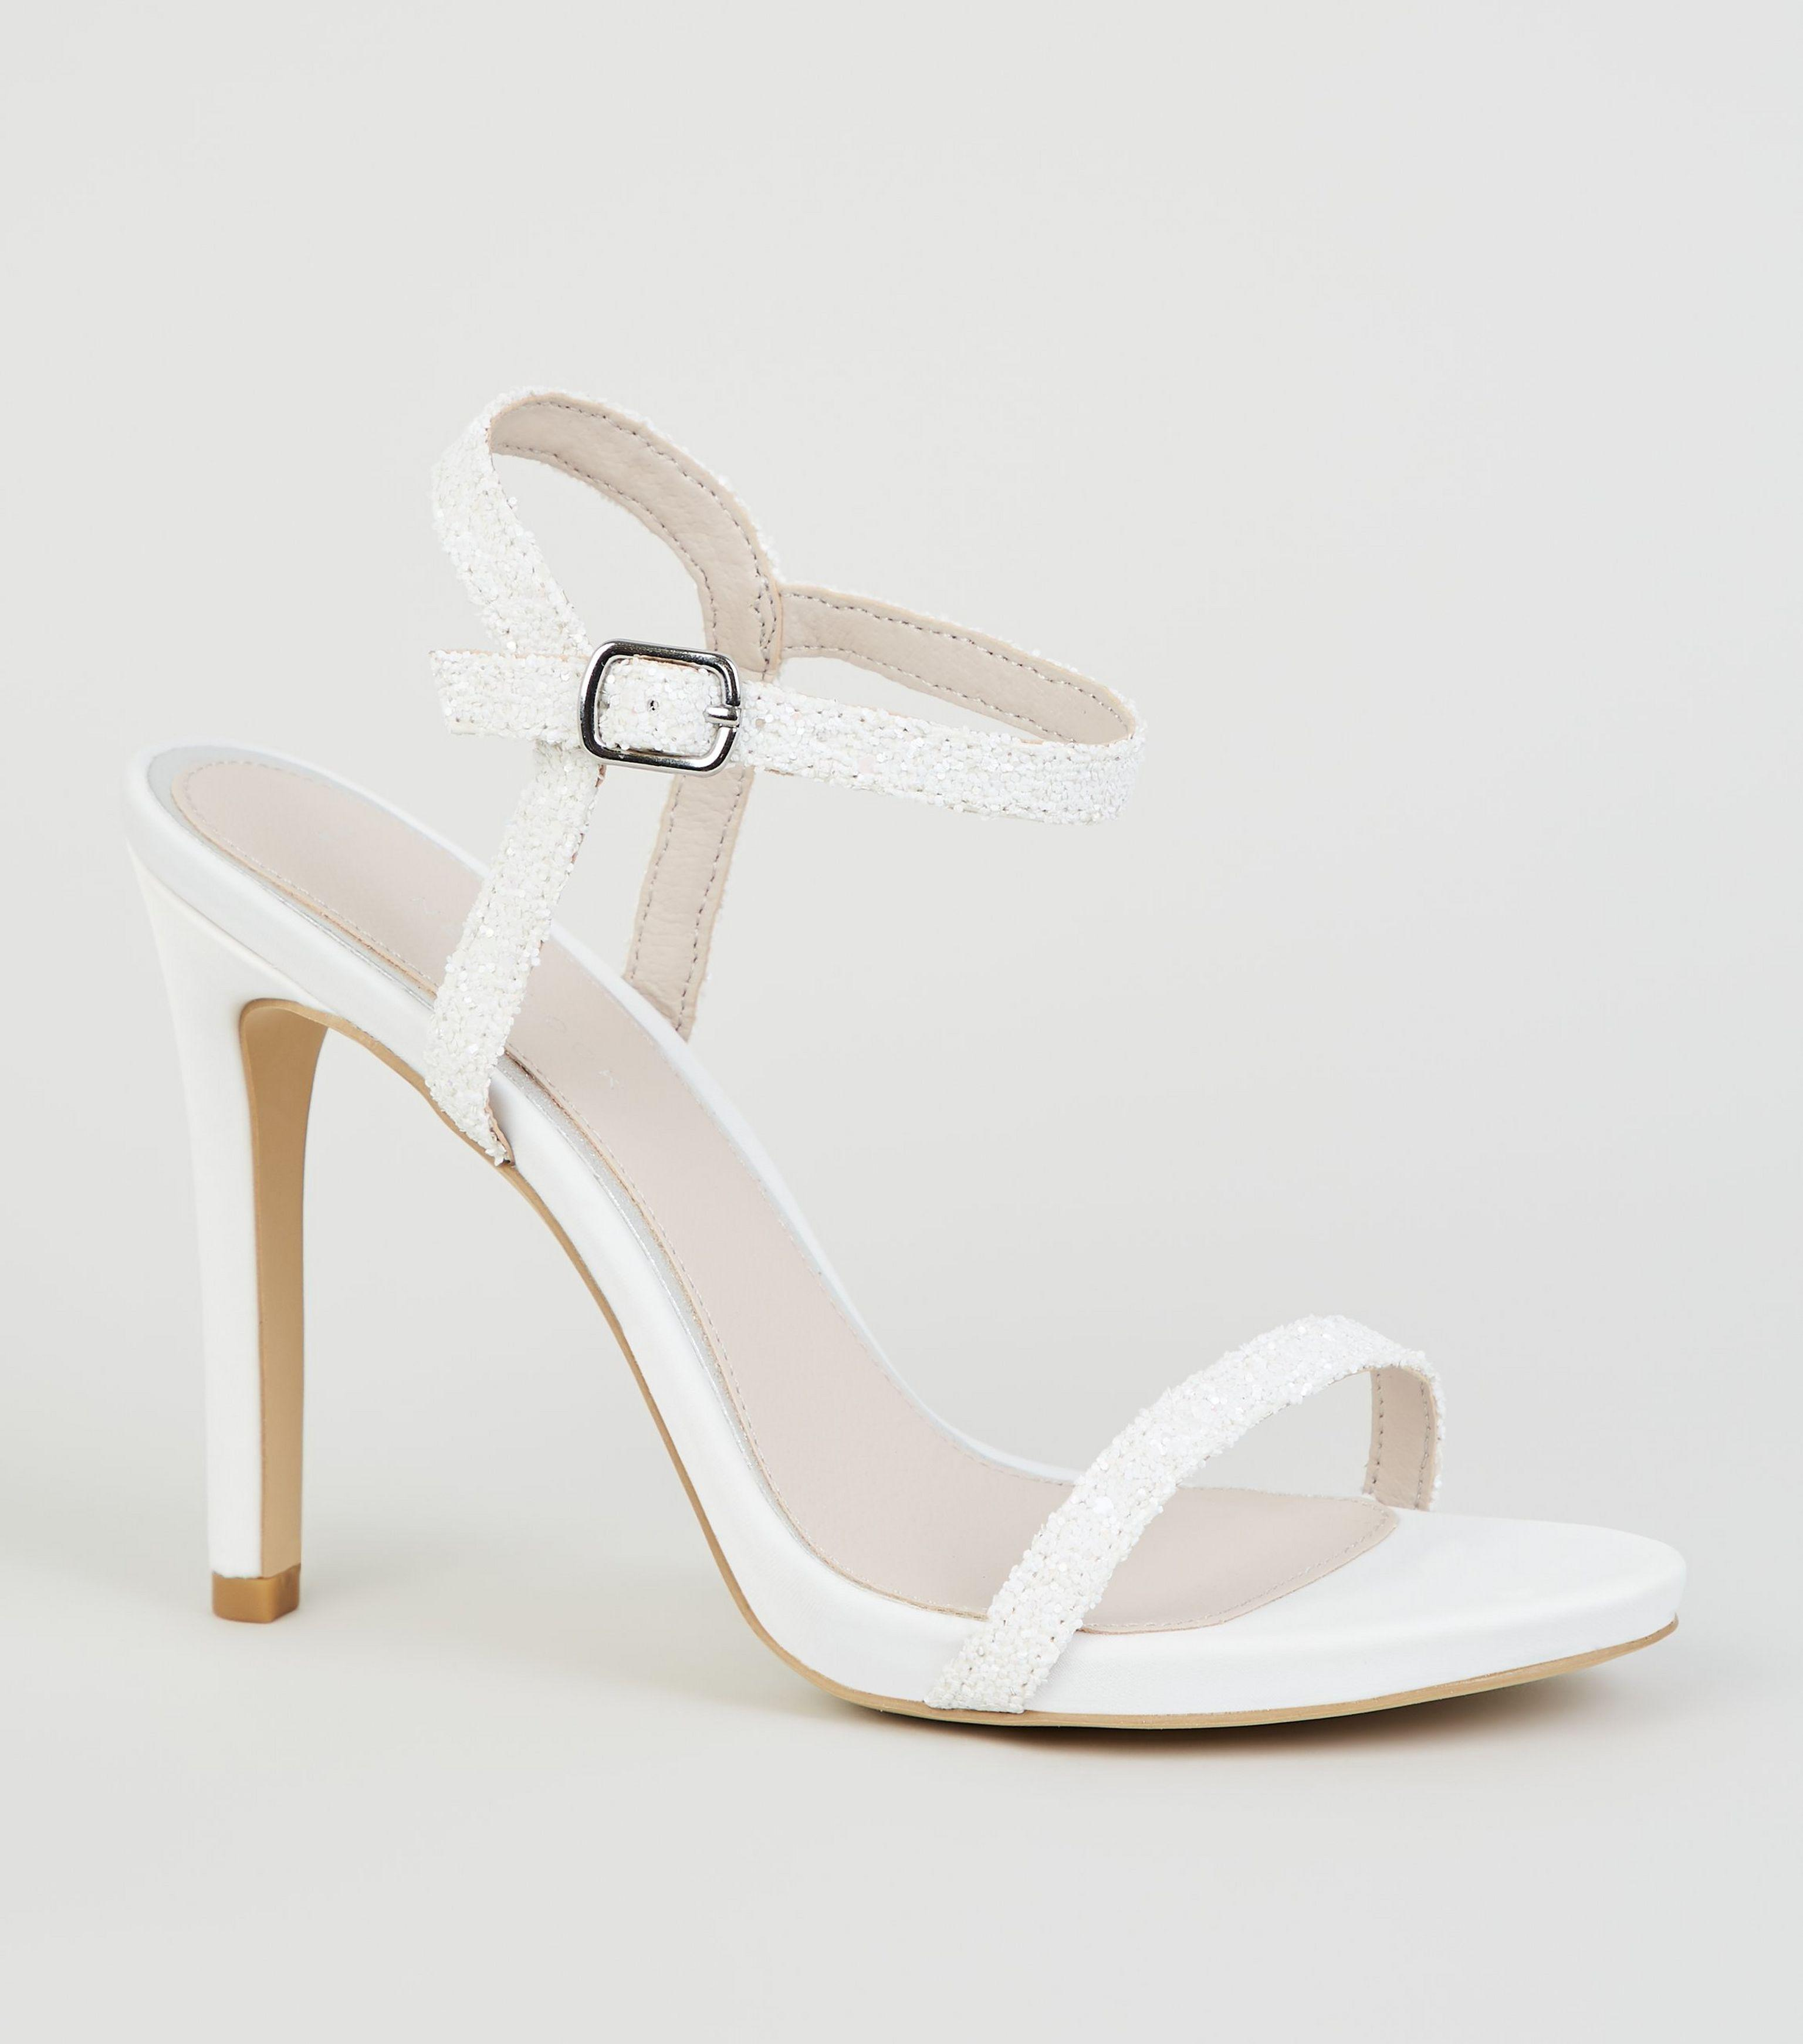 d7549fdc336 New Look White Glitter 2 Part Stiletto Heels in White - Lyst